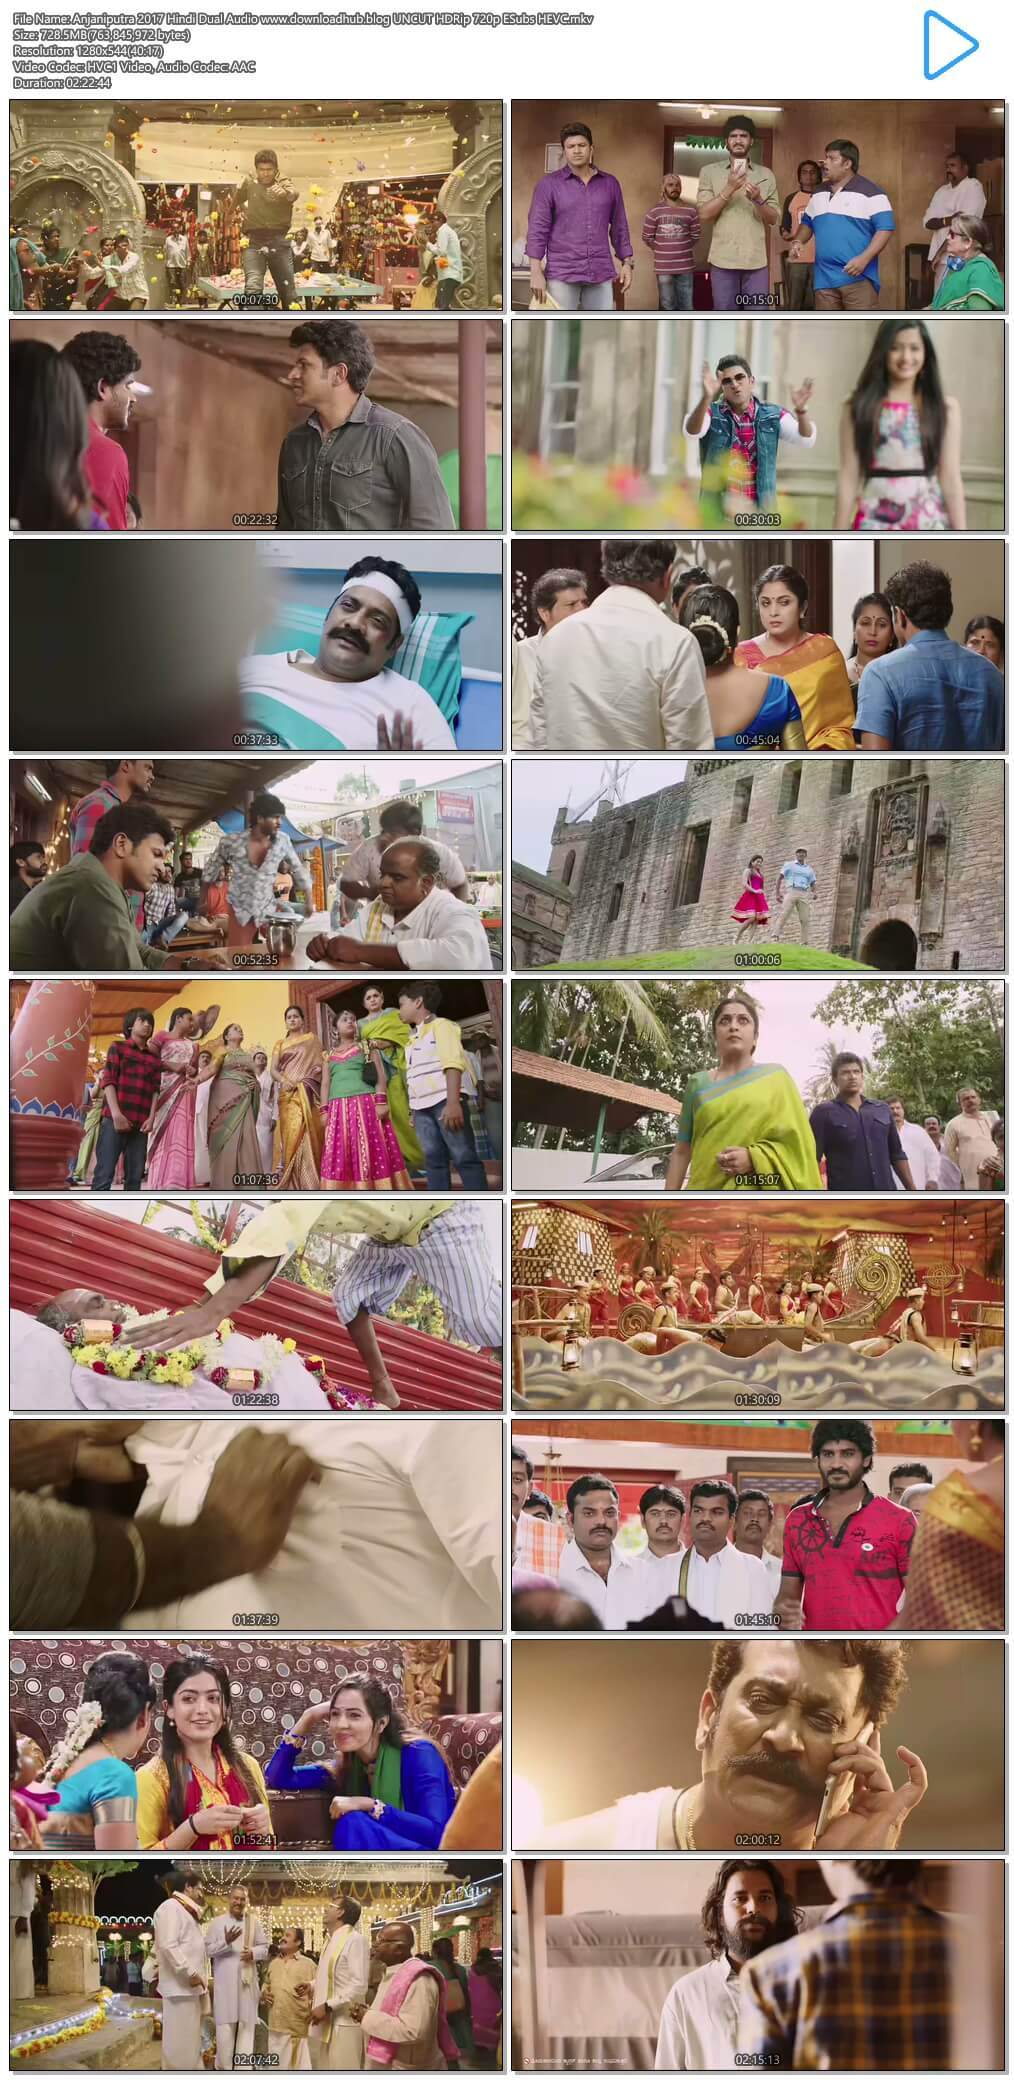 Anjaniputra 2017 Hindi Dual Audio 700MB UNCUT HDRip 720p ESubs HEVC